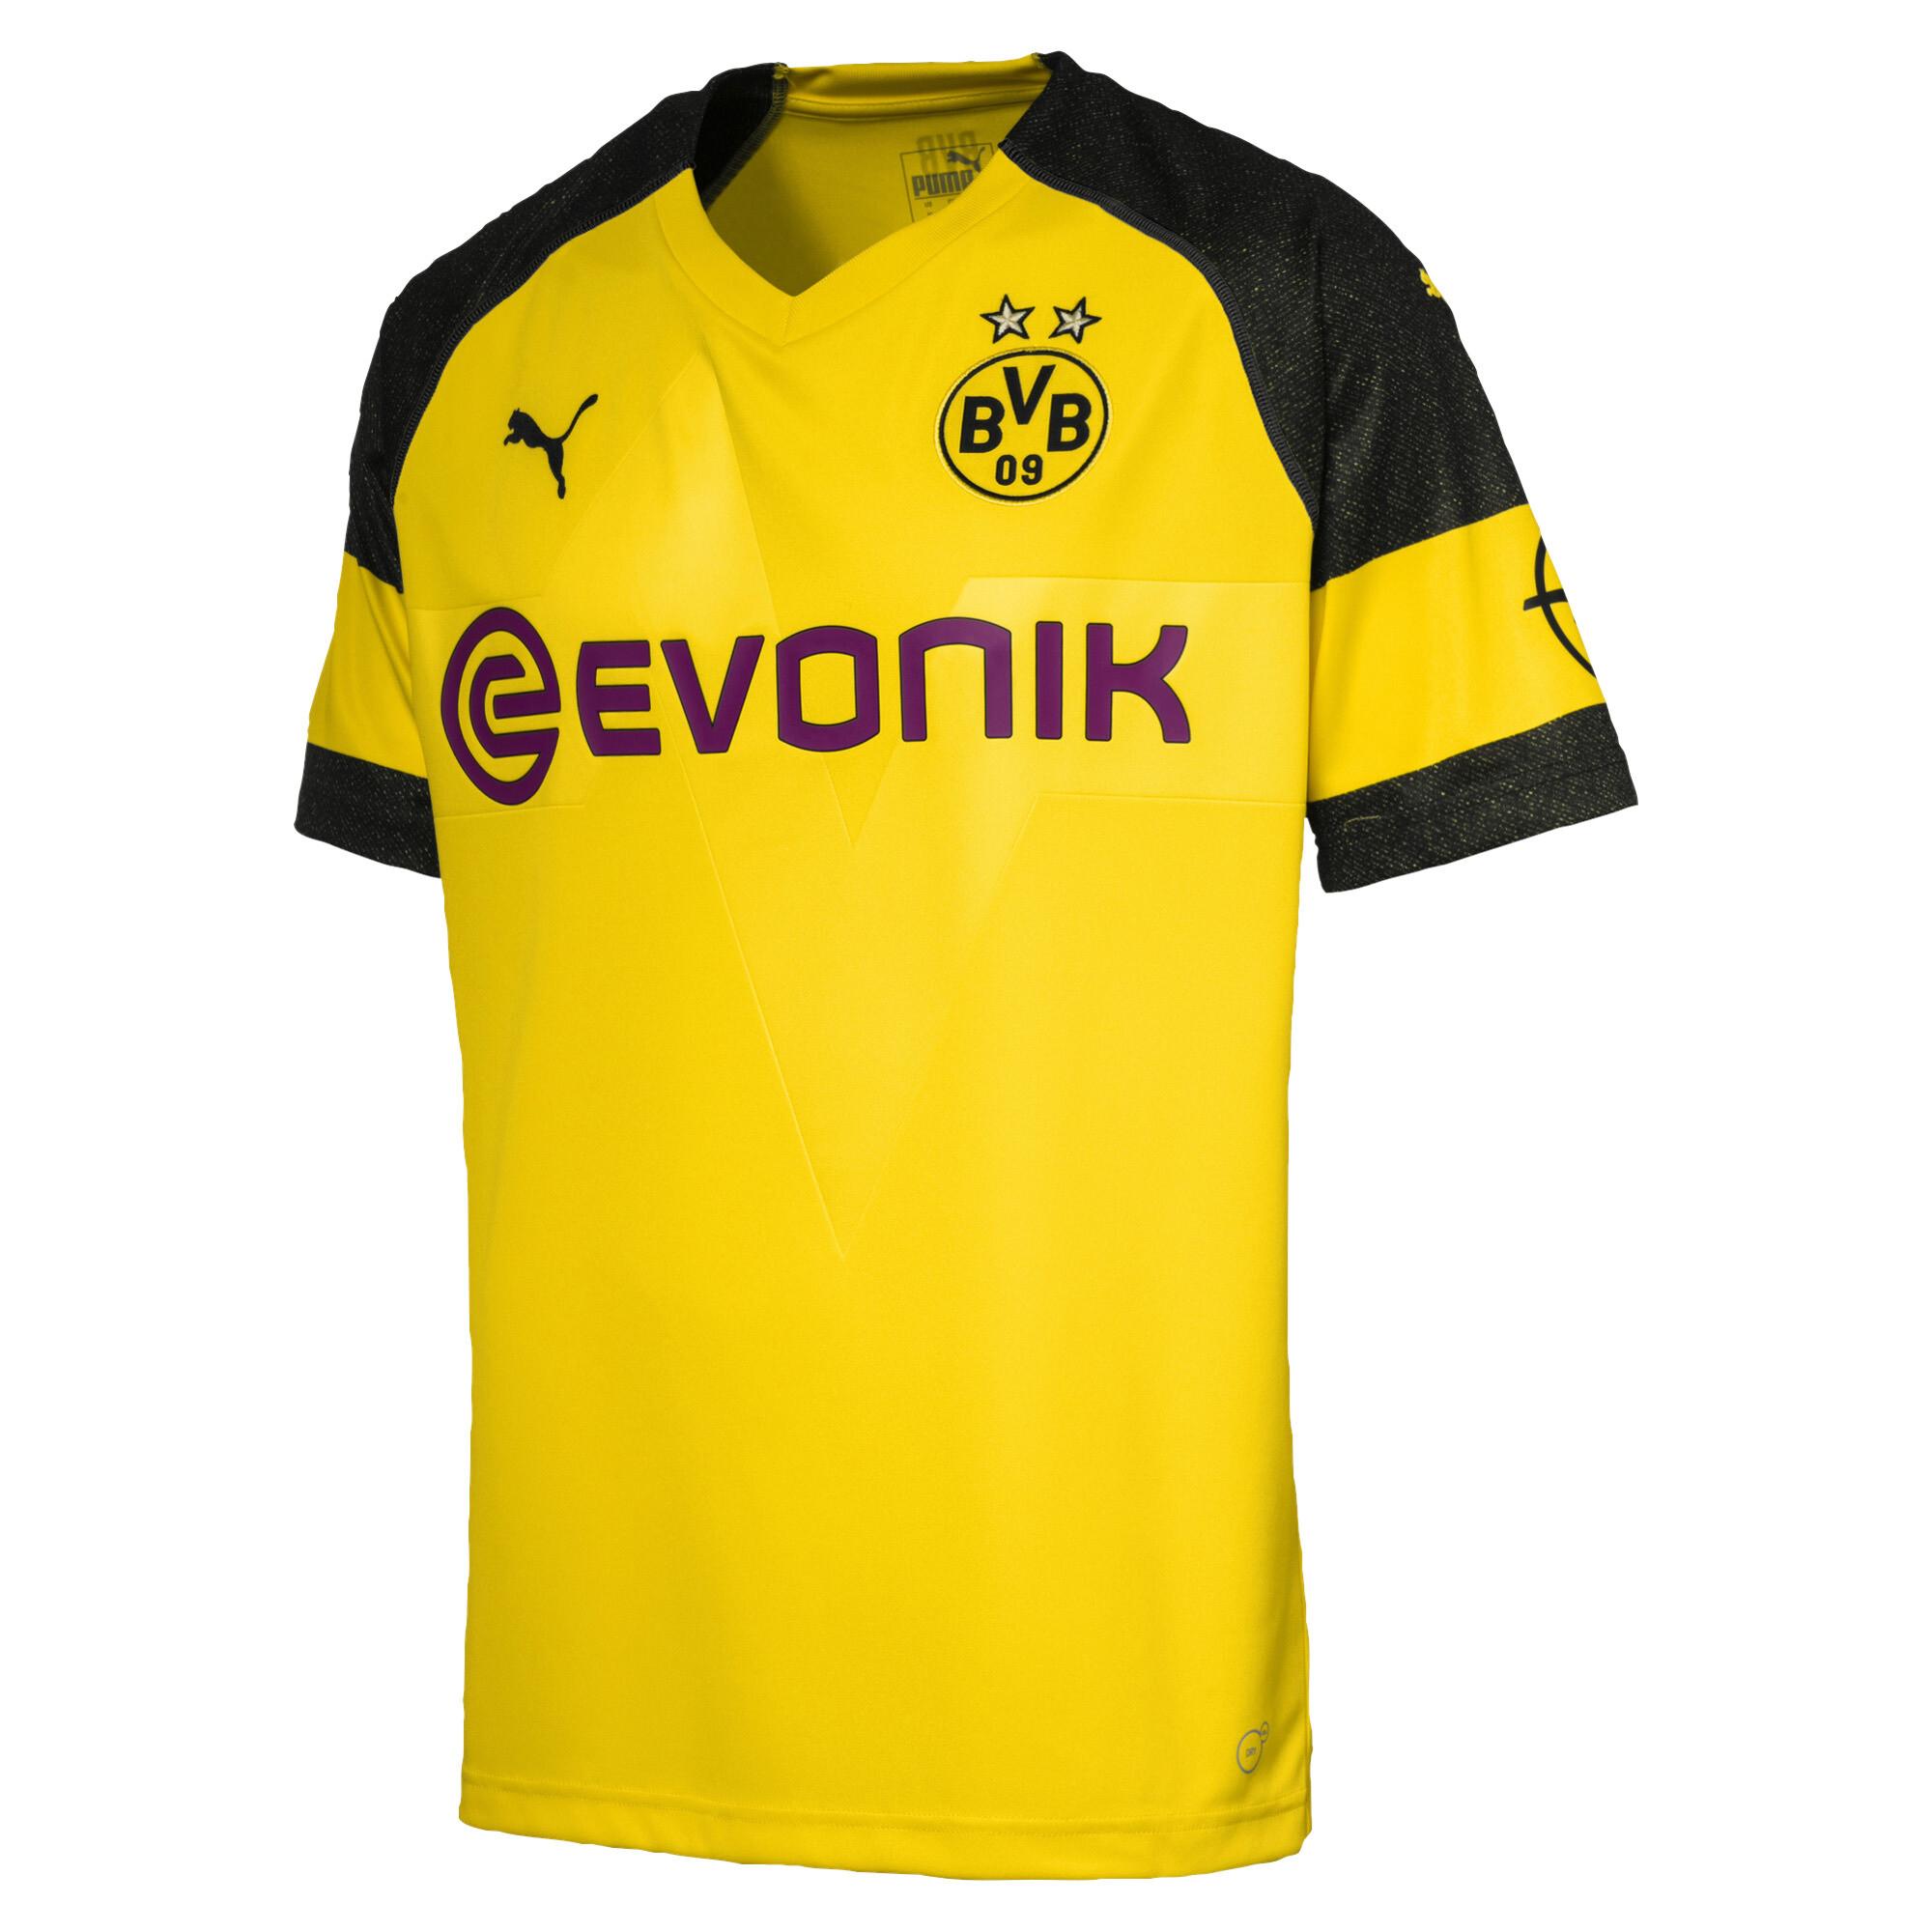 PUMA Mens Standard BVB Cup Shirt Replica Jr with Evonik Logo